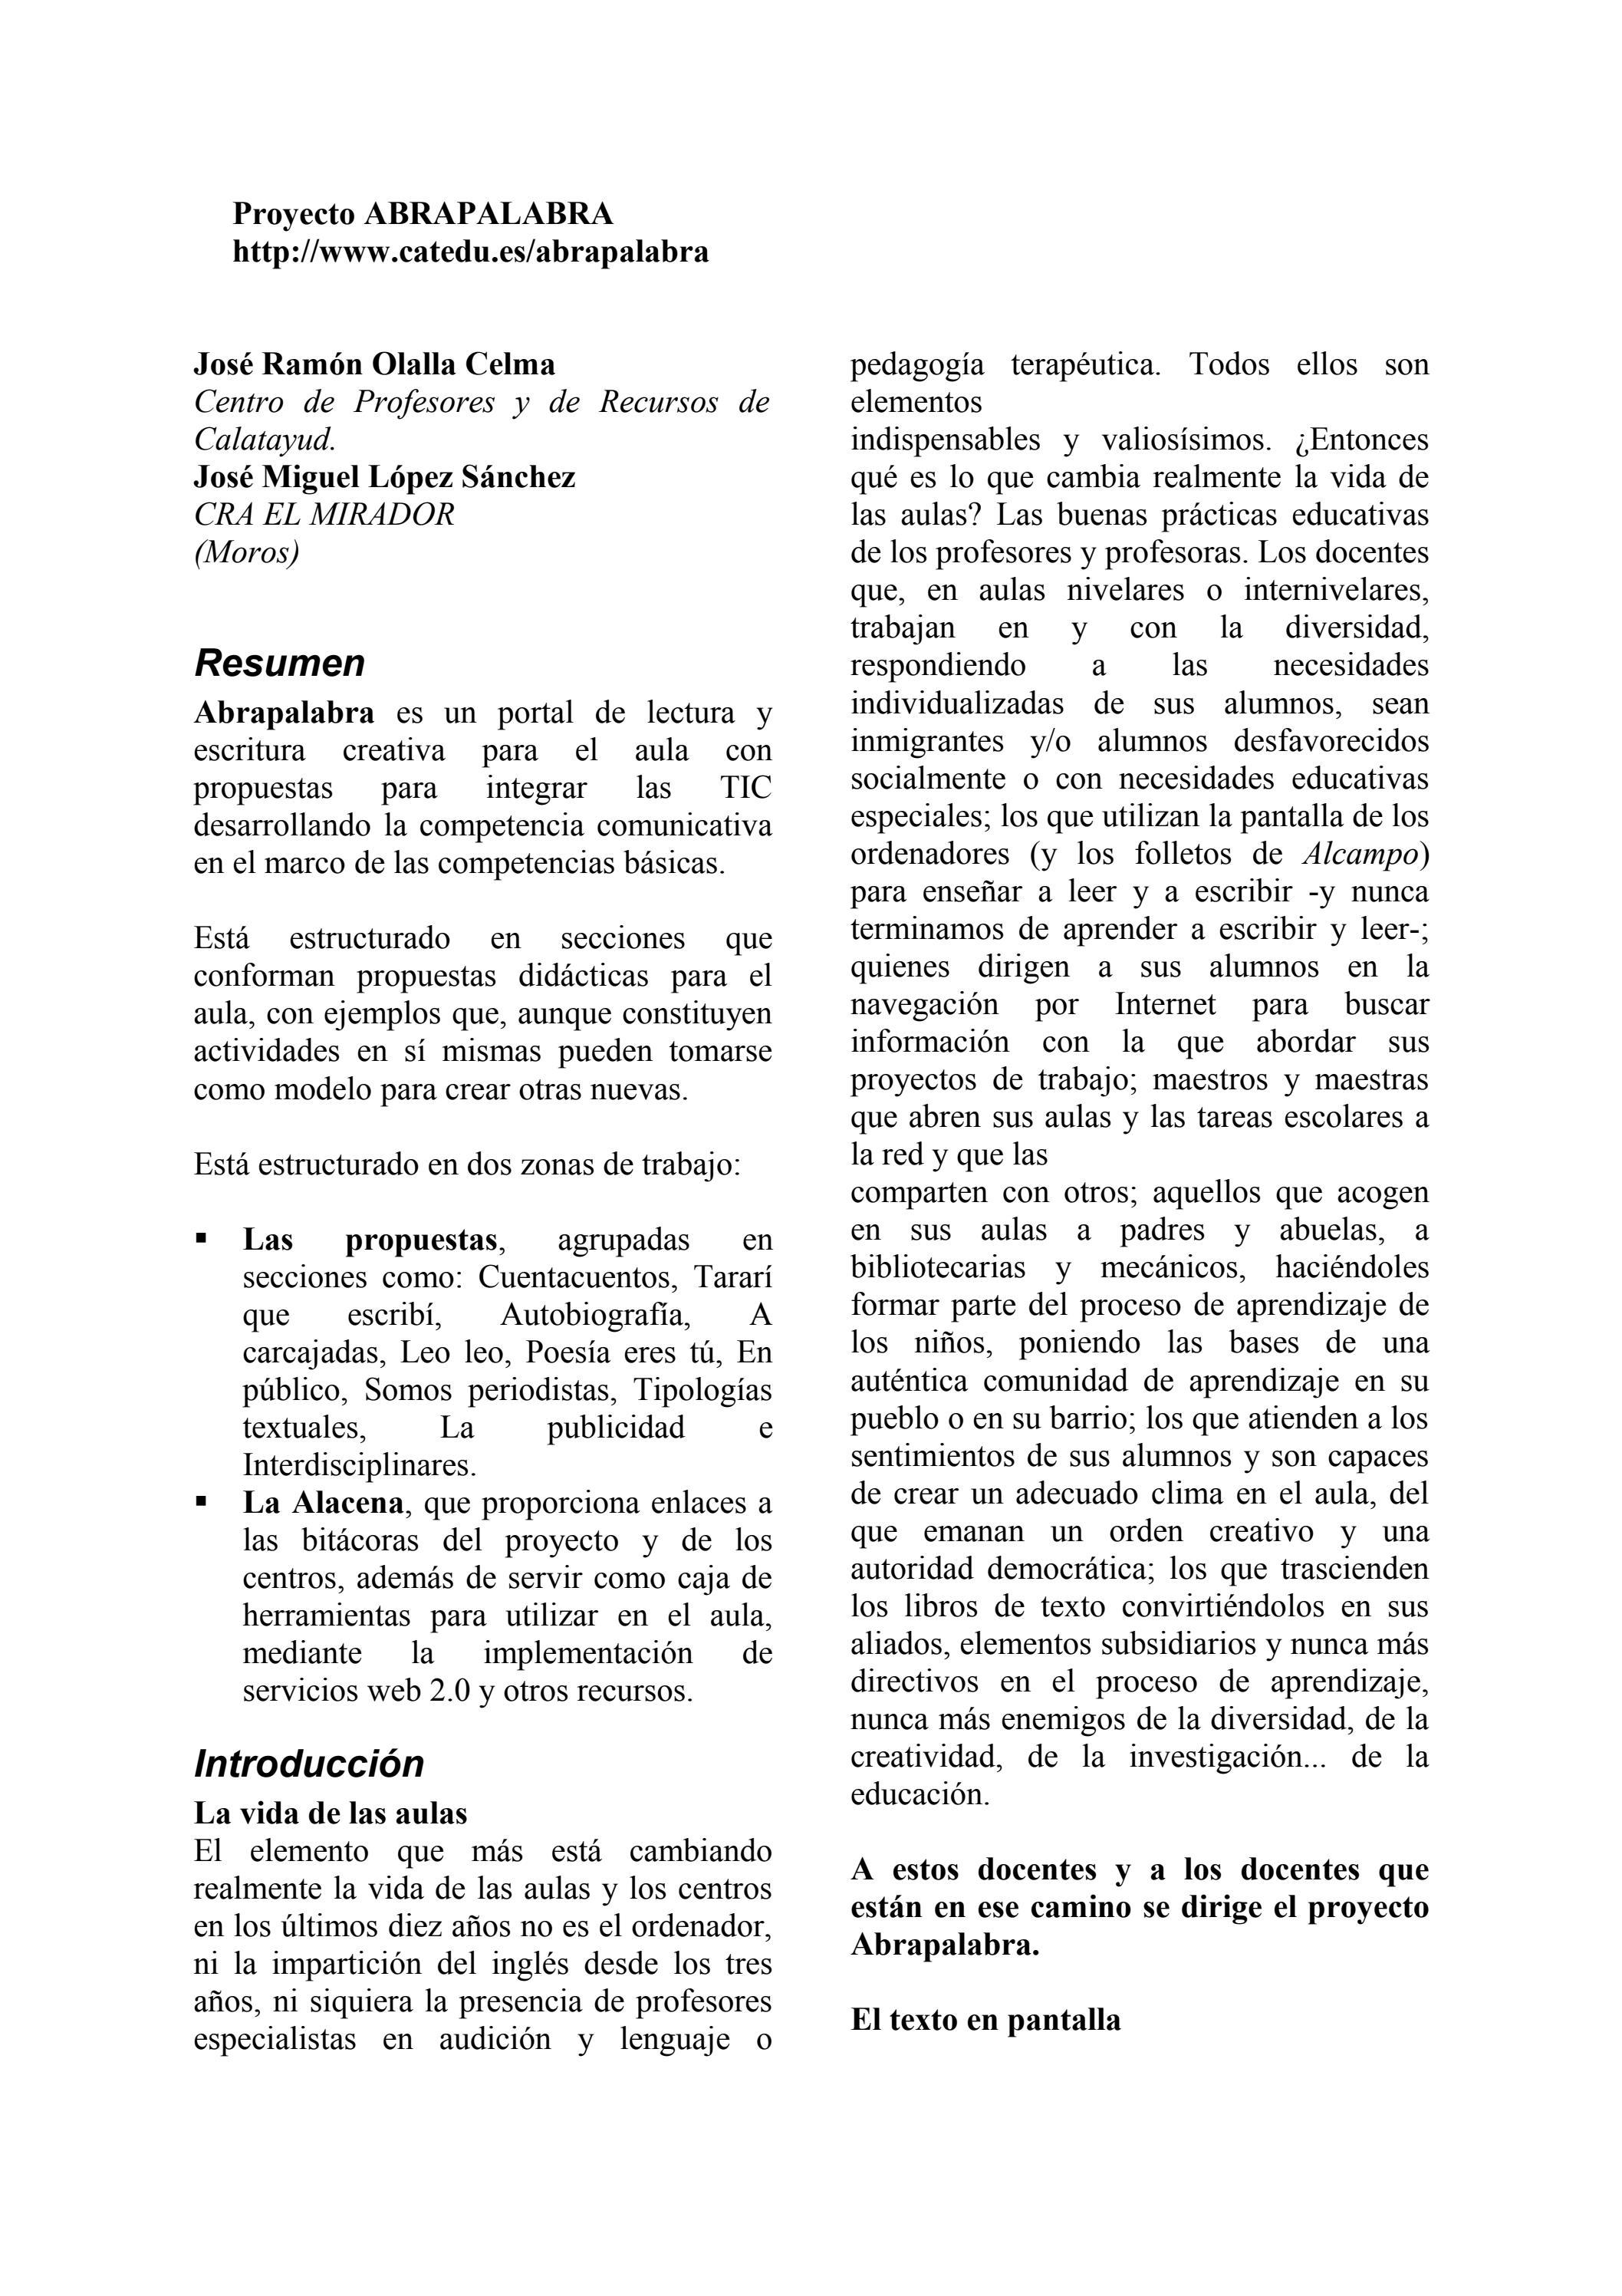 Proyecto Abrapalabra by José Ramón Olalla - issuu